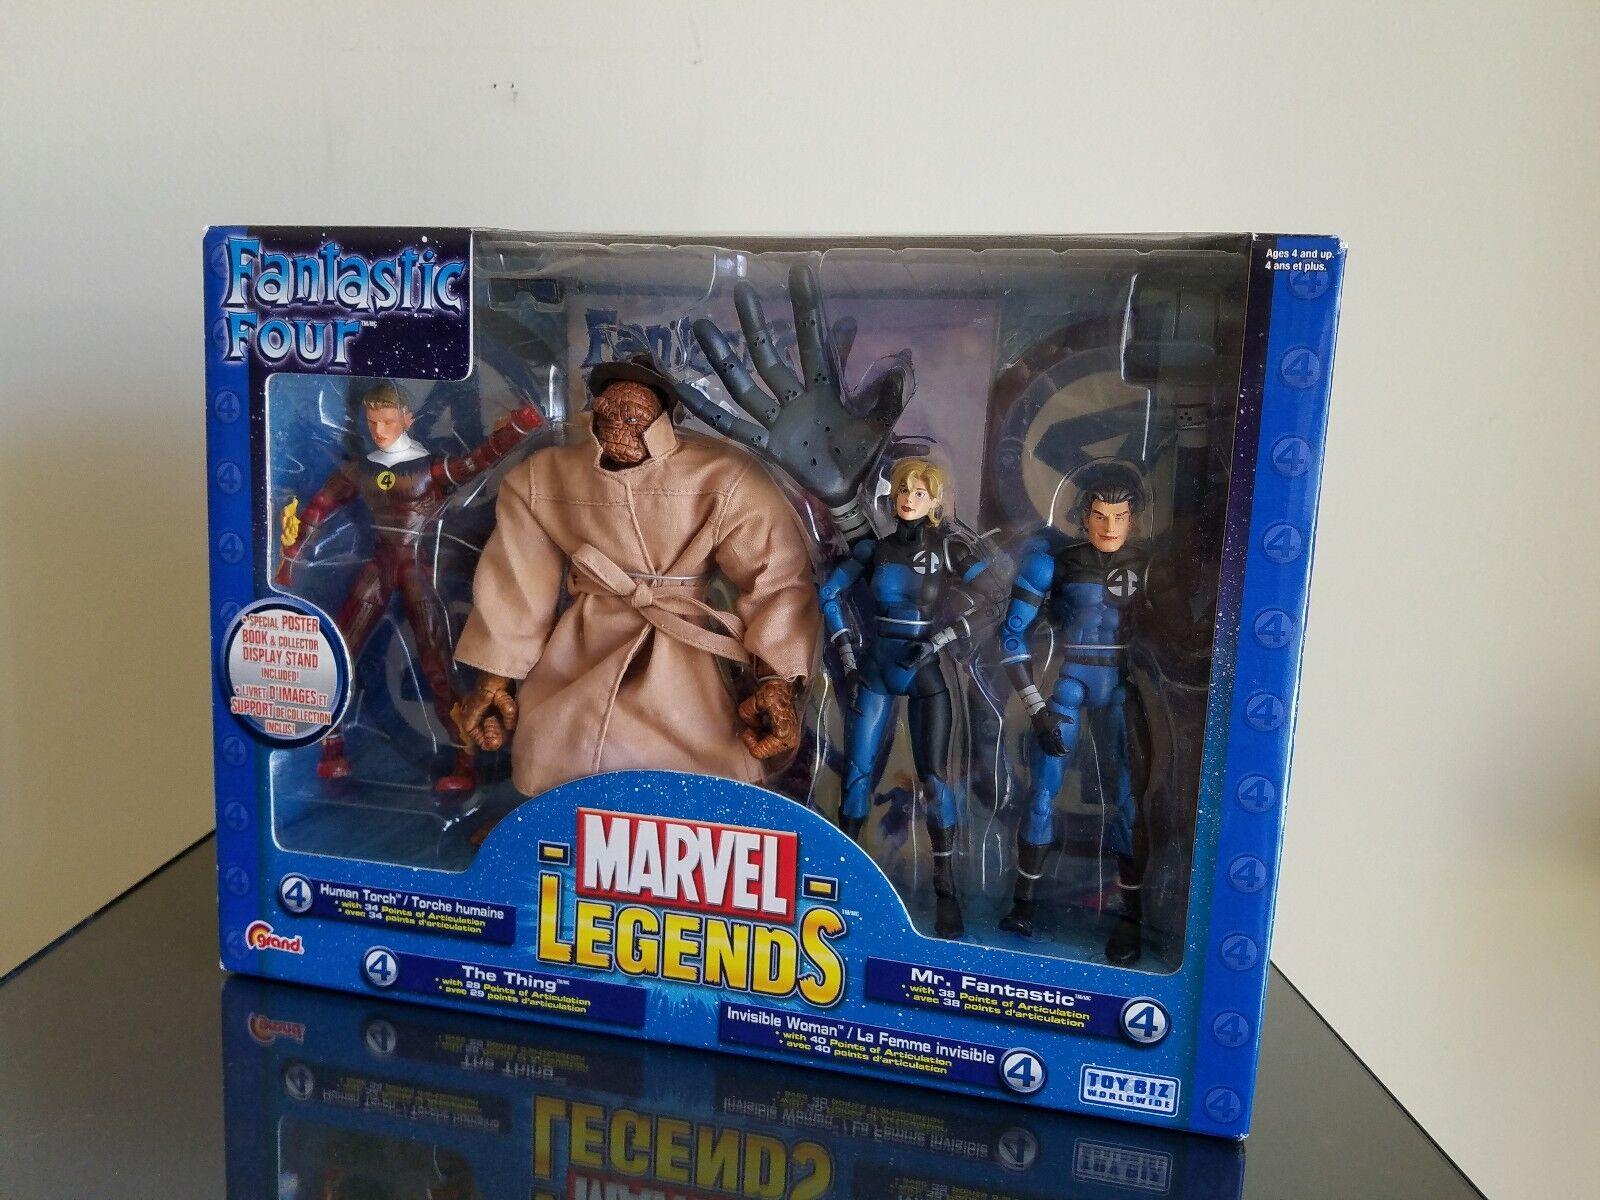 MARVEL LEGENDS FANTASTIC FOUR 4 FIGURE BOX SET Toy Biz